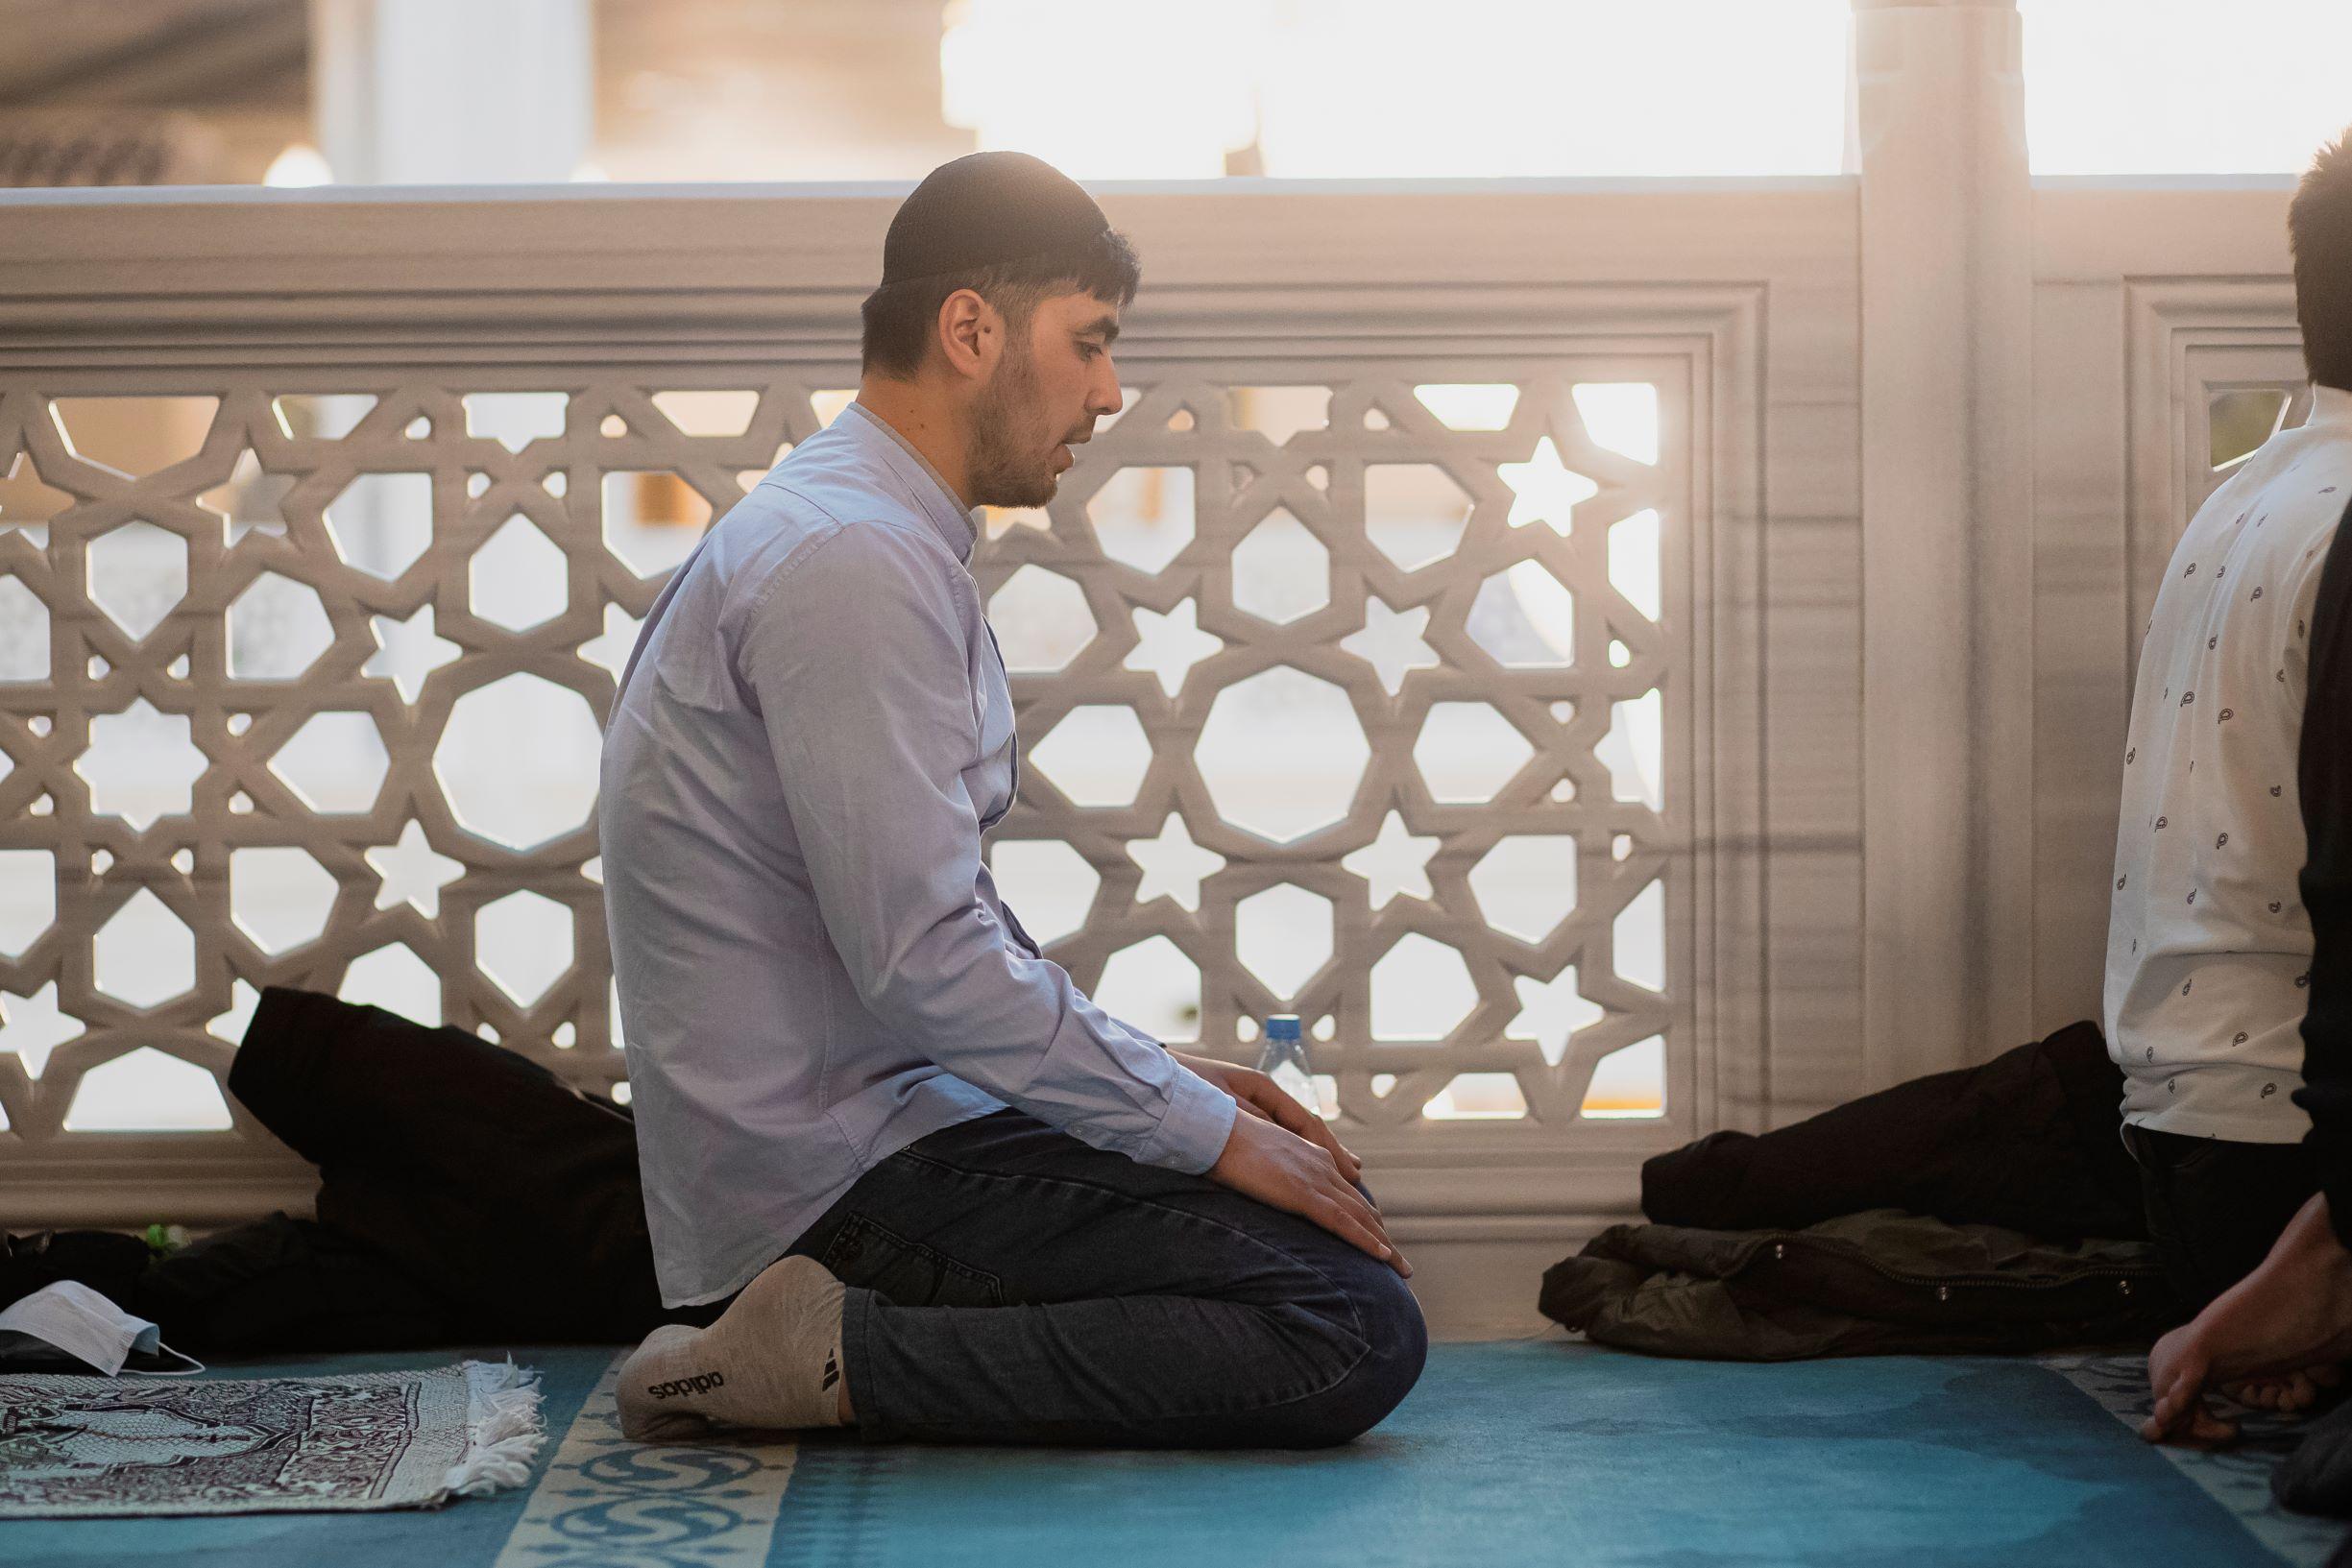 Мусульмане Москвы в молитве встречают месяц Рамадан | Фото